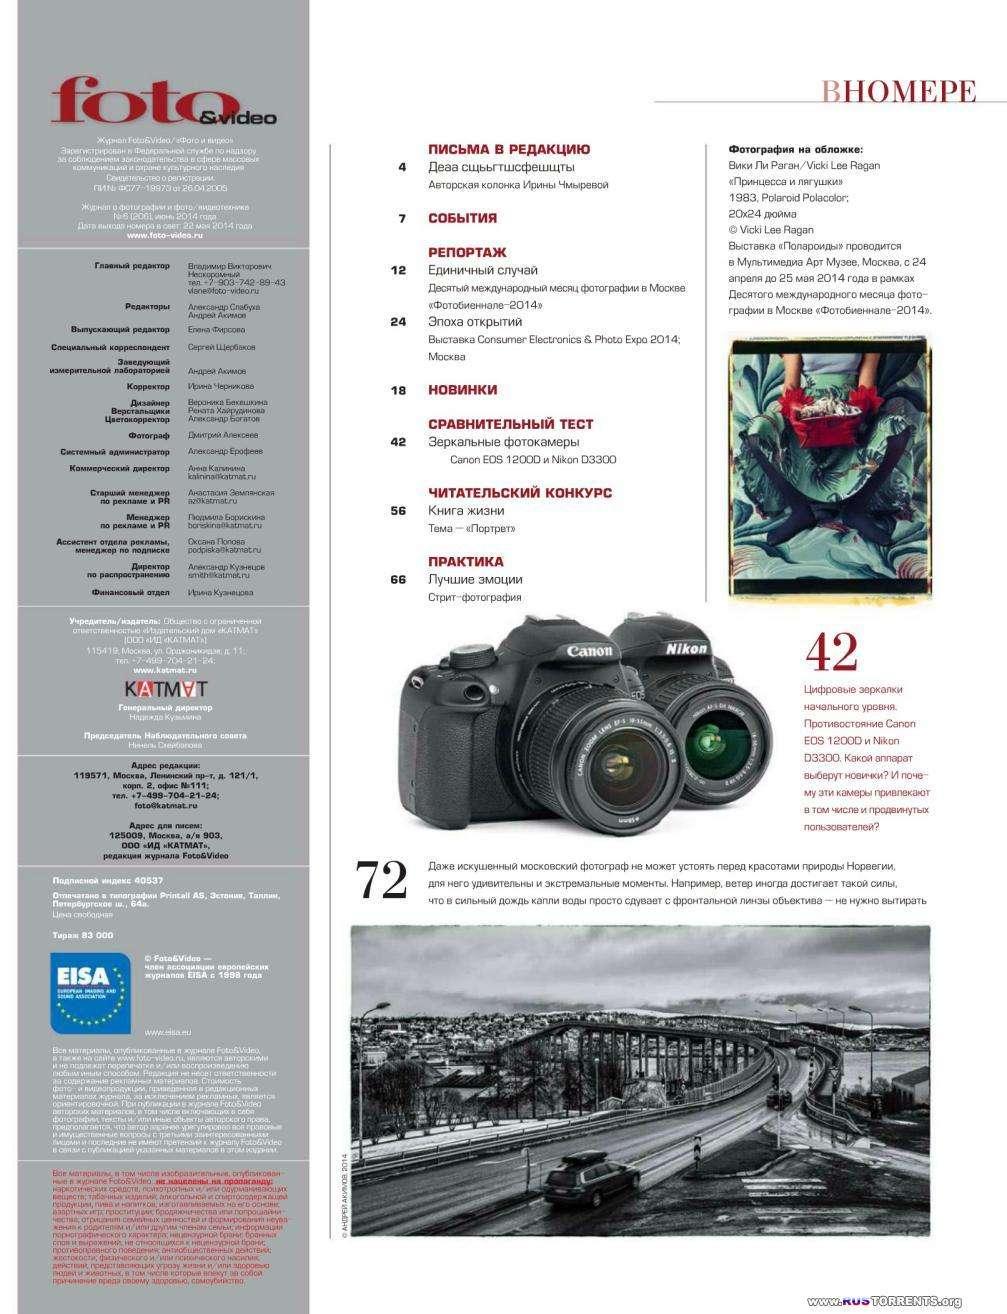 Foto & Video №6 [Июнь 2014] | PDF